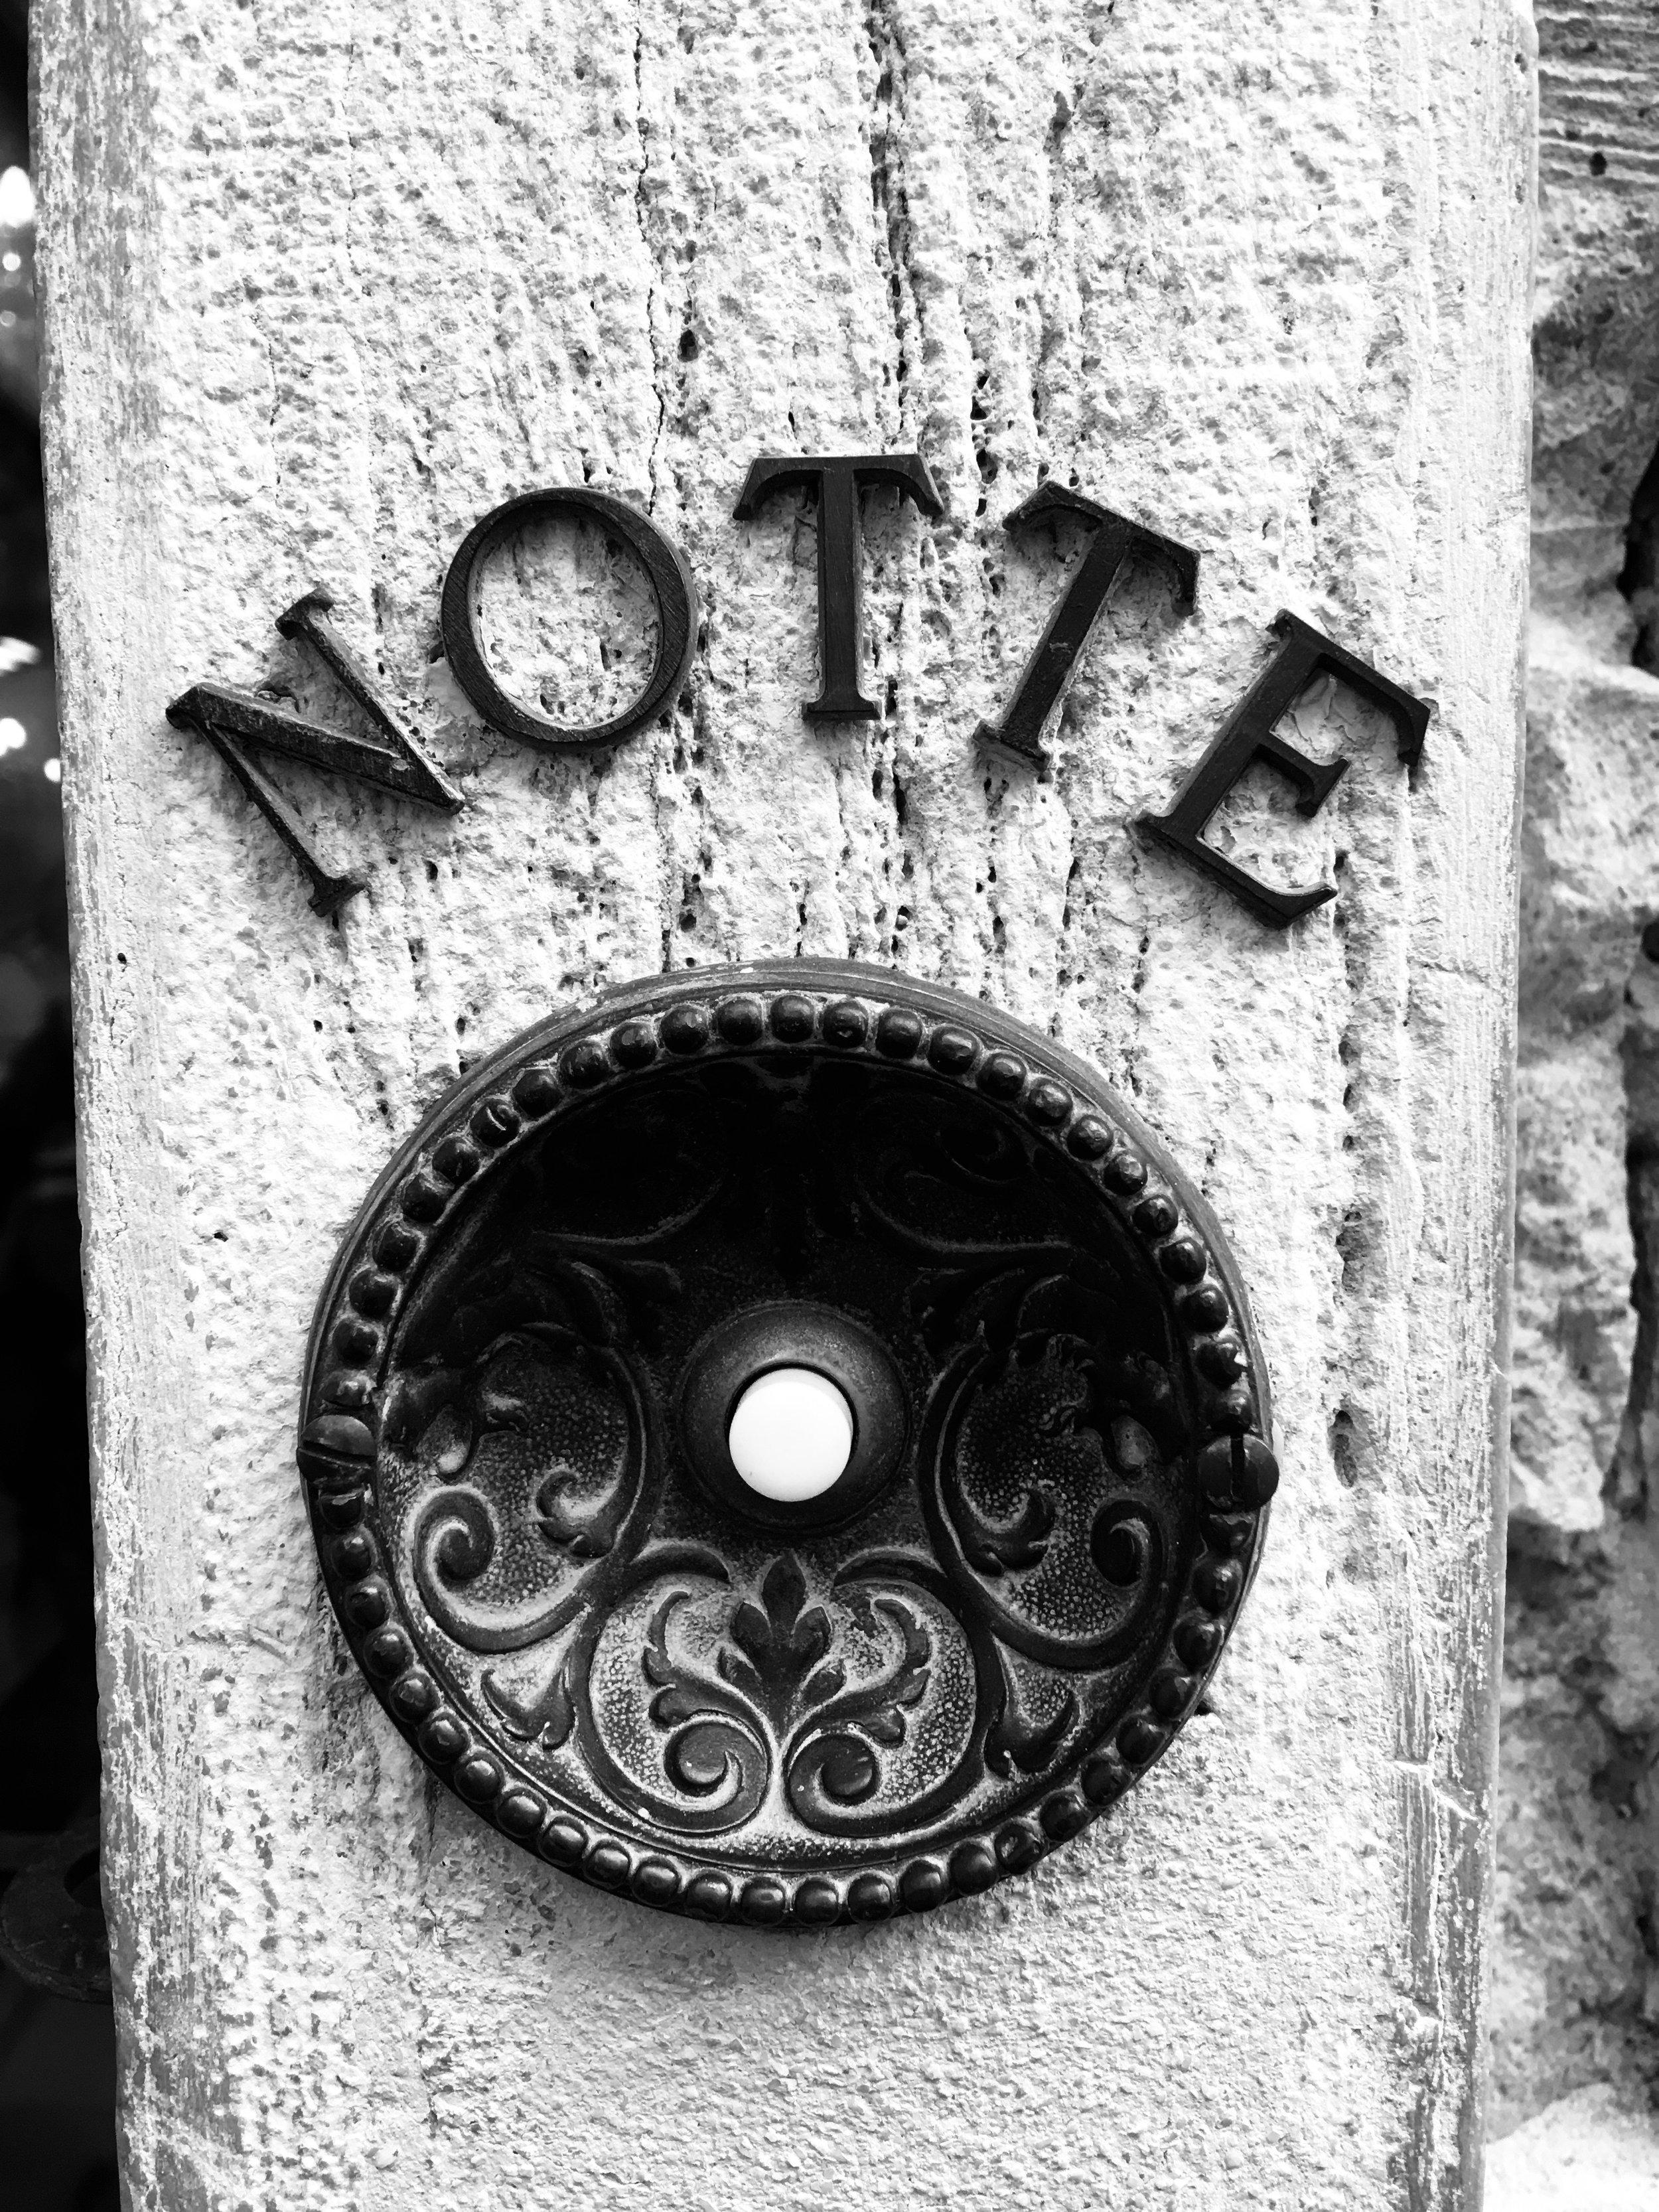 The night bell, Venice, Italy.